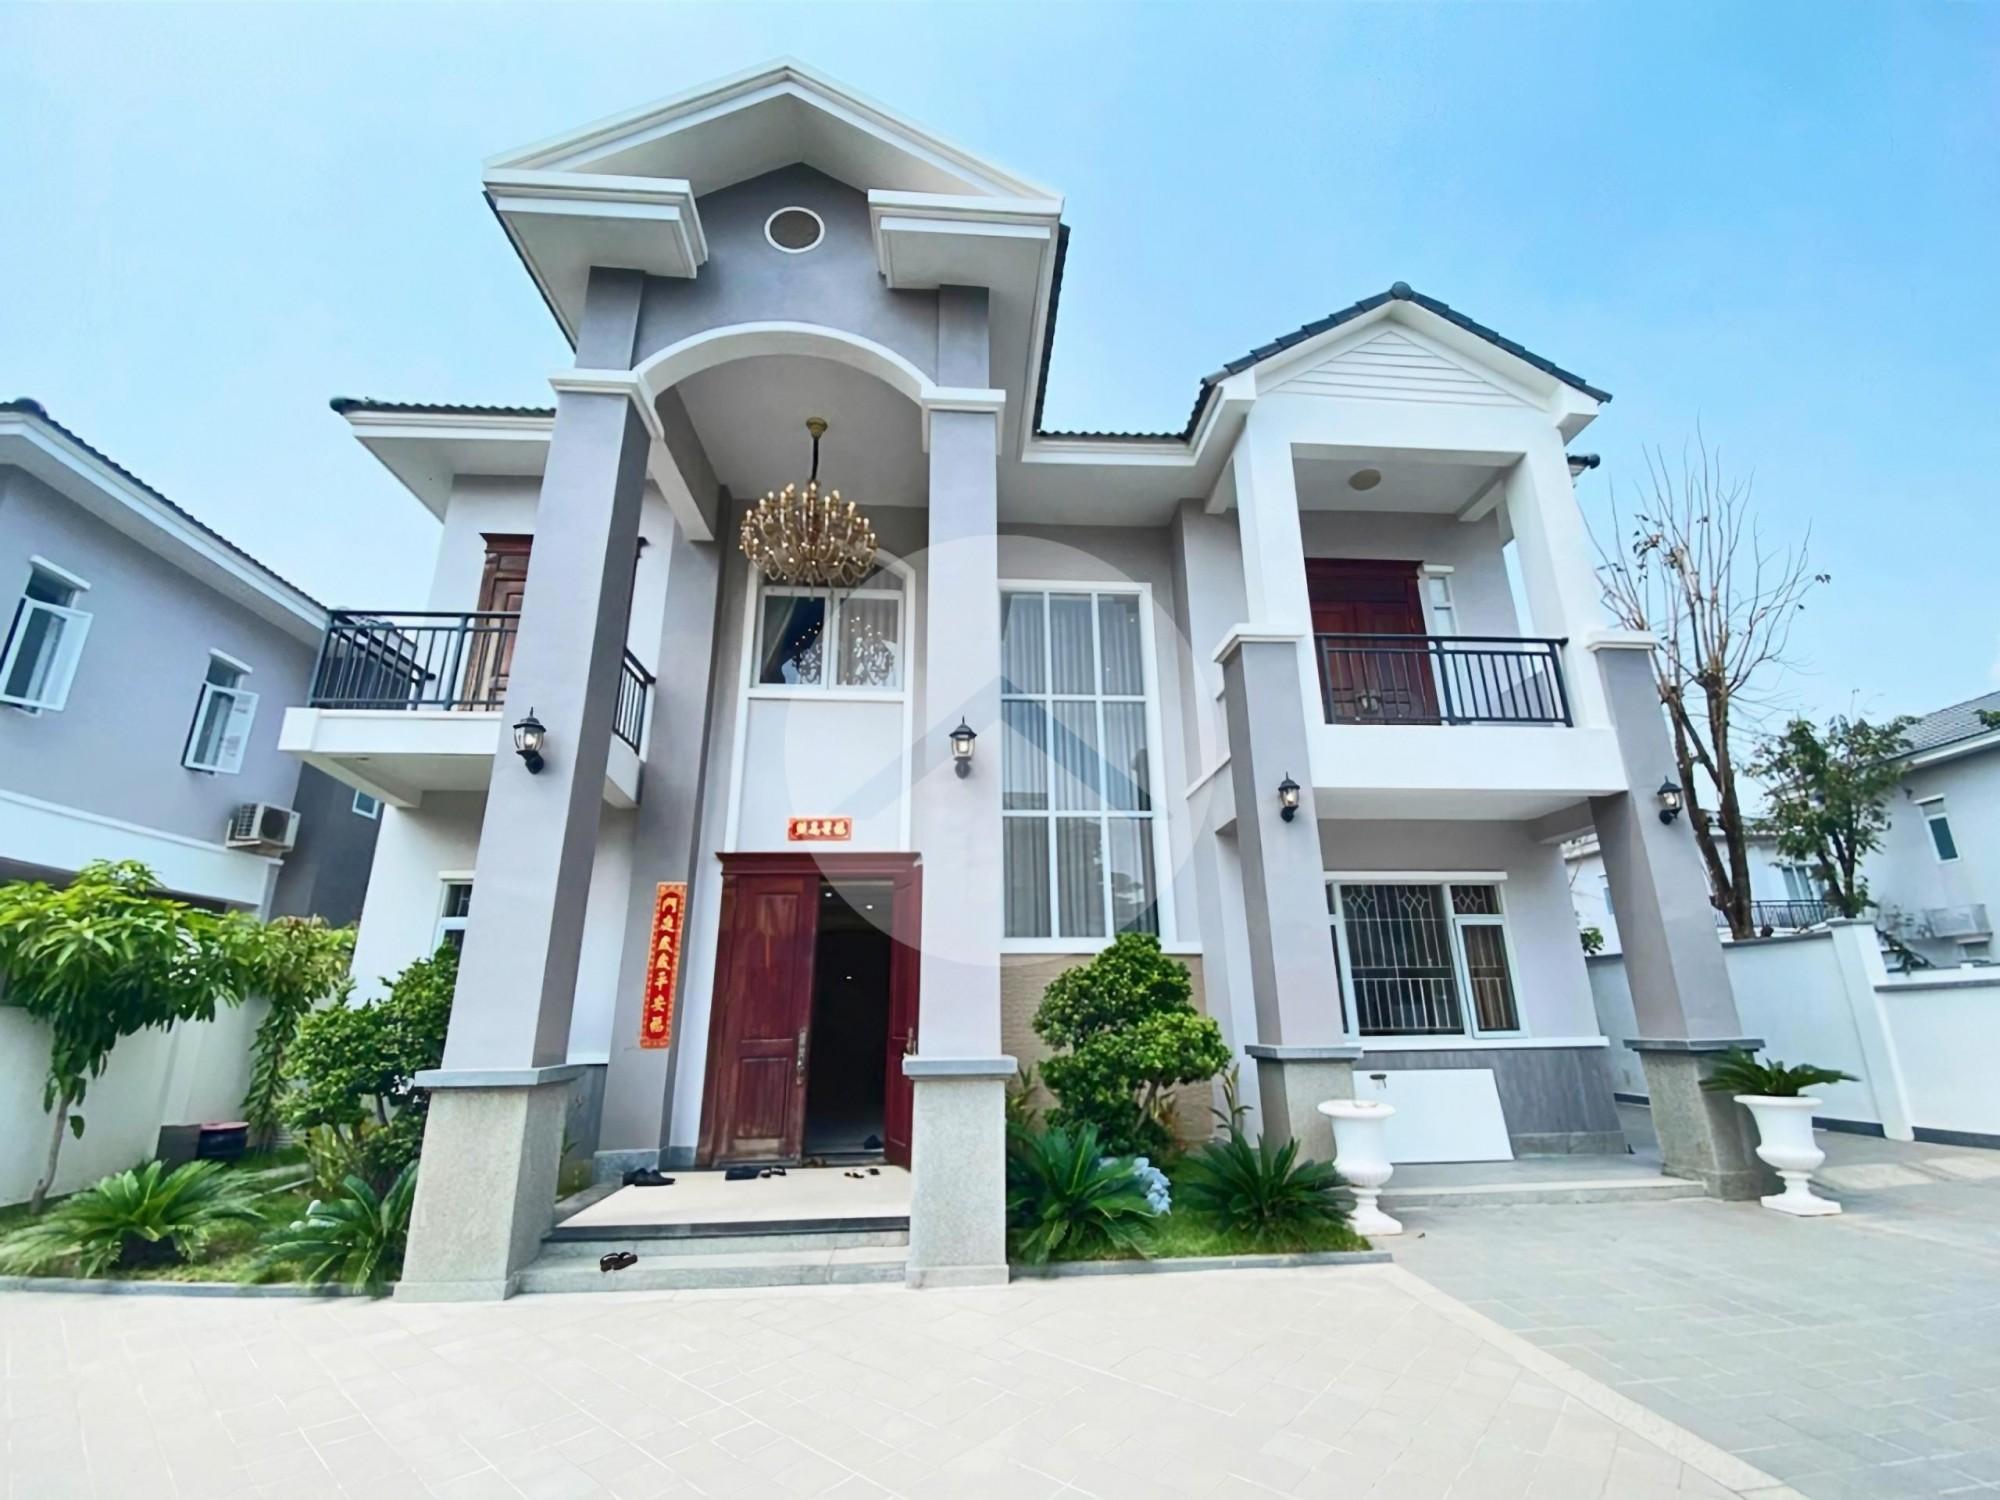 5 Bedroom Villa For Sale - Prek Leap, Phnom Penh